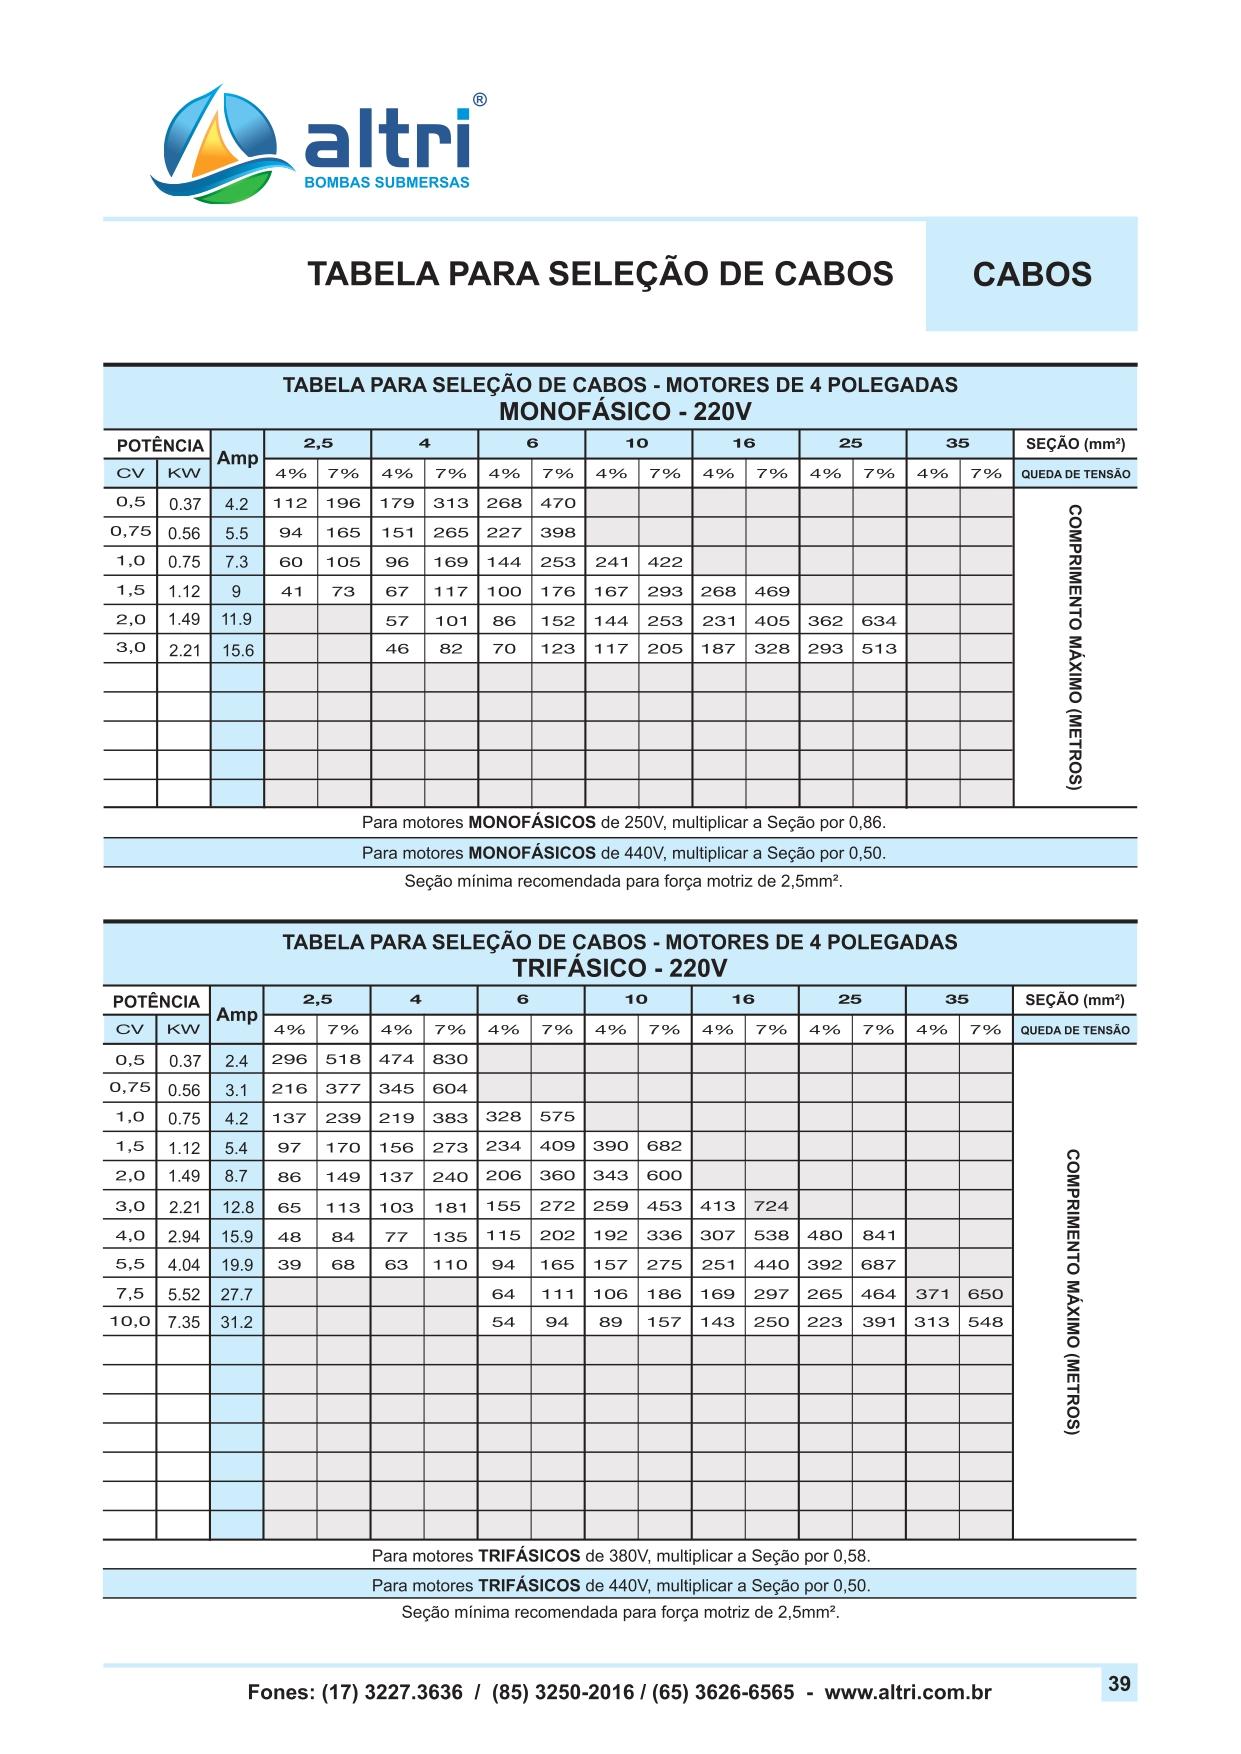 CATALOGO DE PRODUTOS ALTRI 2021 - WEB_page-0041